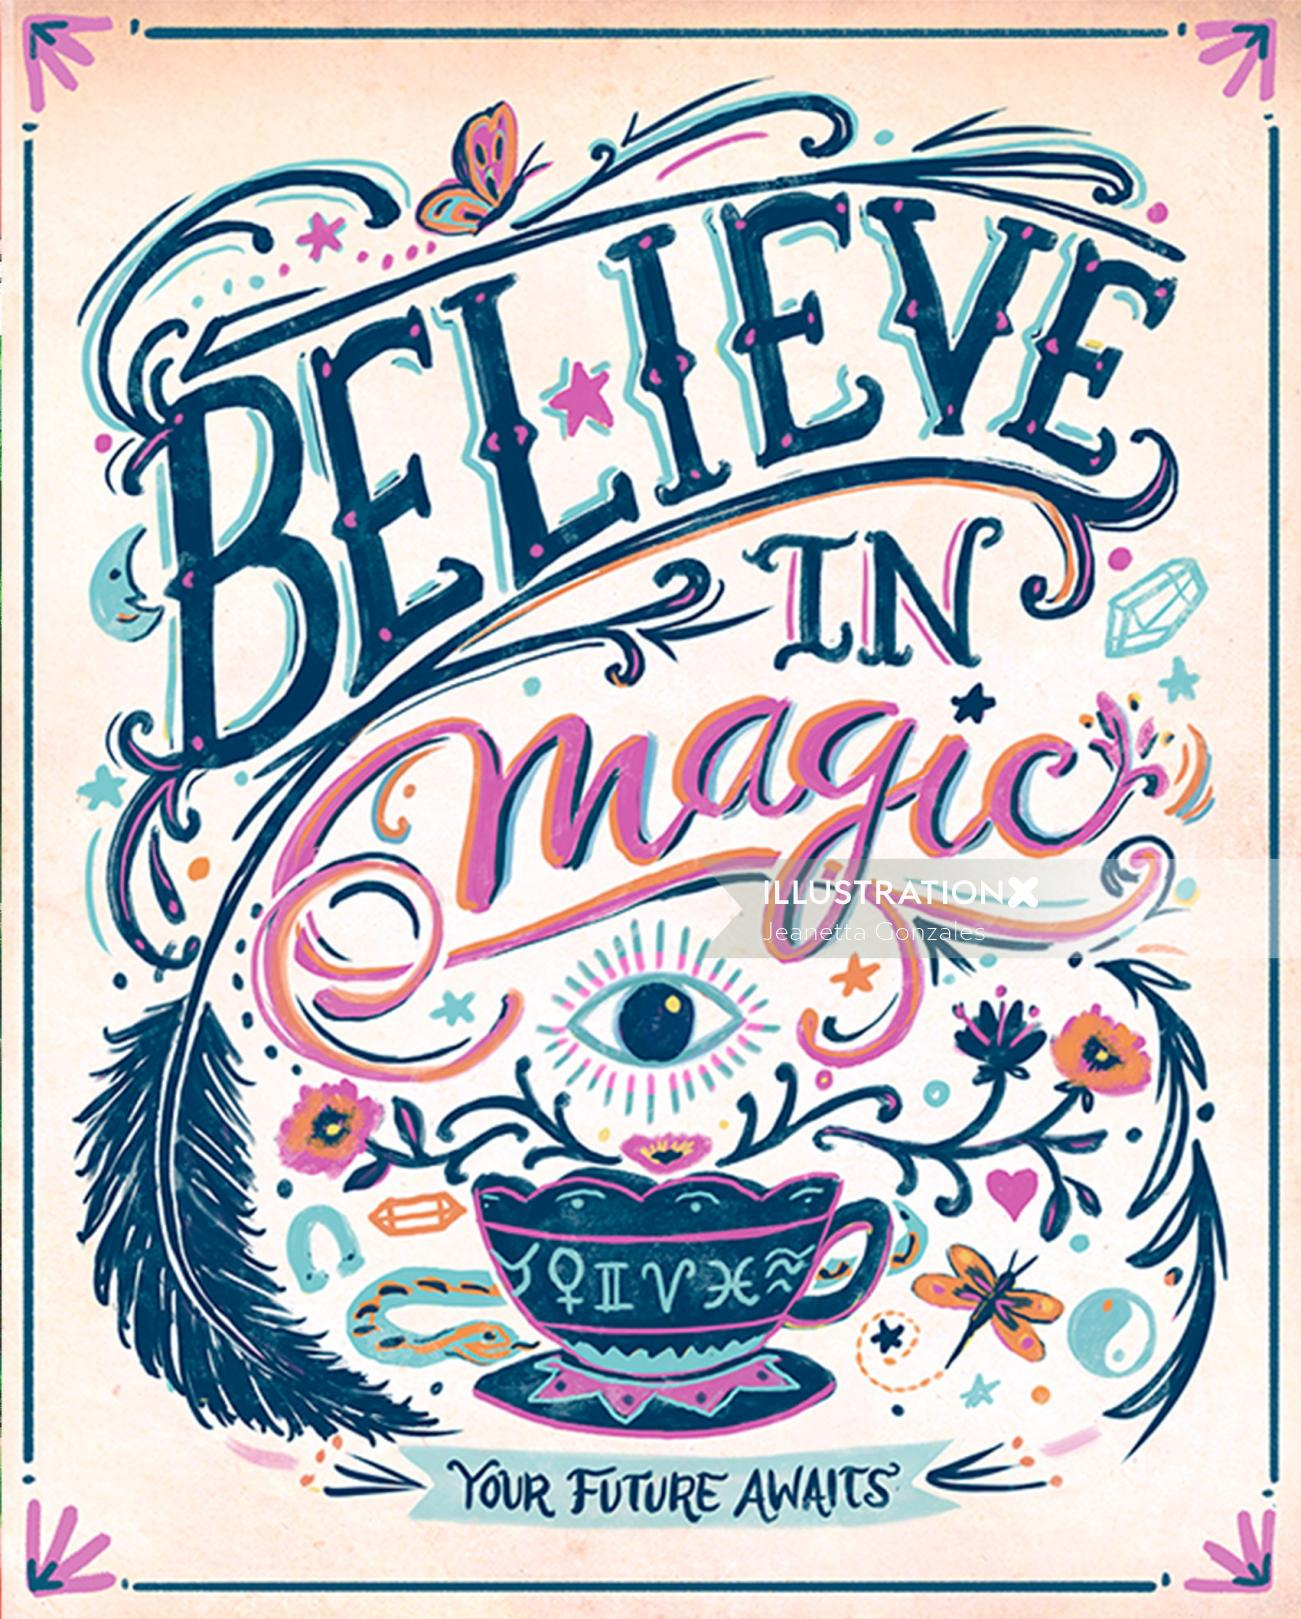 Calligraphy art of believe in magic